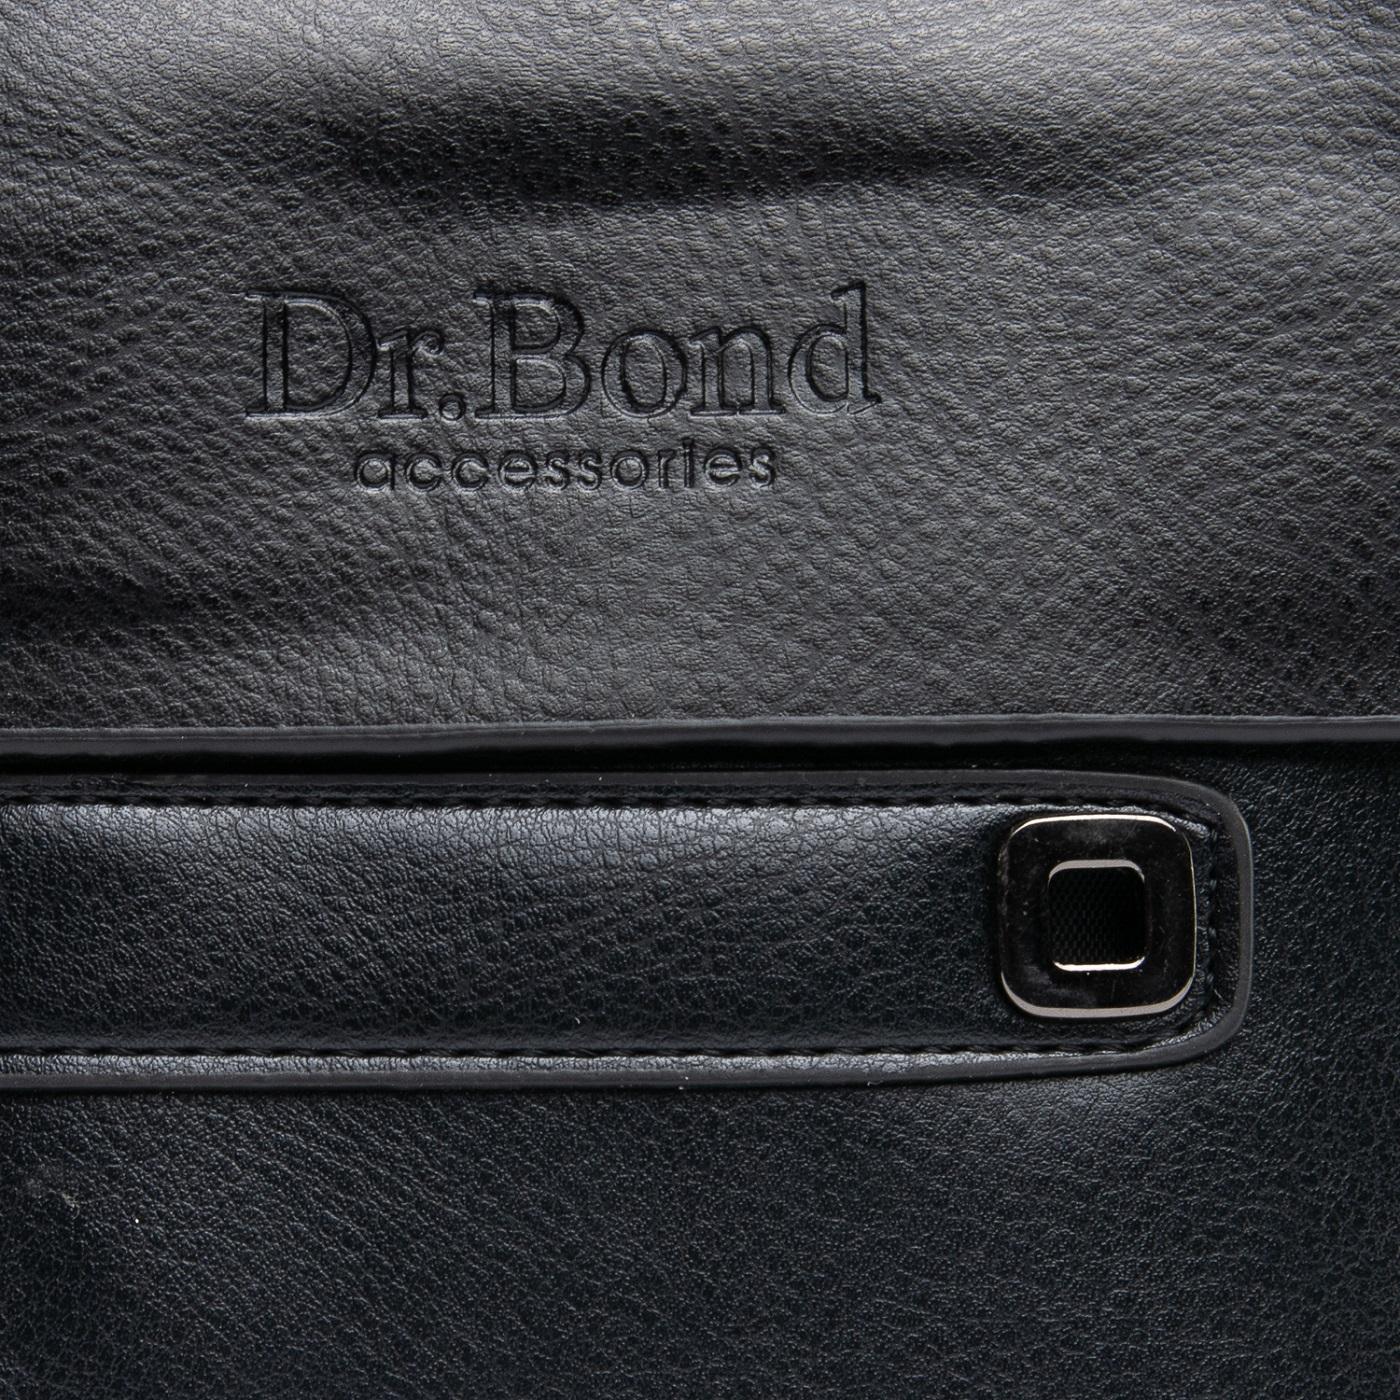 Сумка Мужская Планшет иск-кожа DR. BOND GL 512-1 black